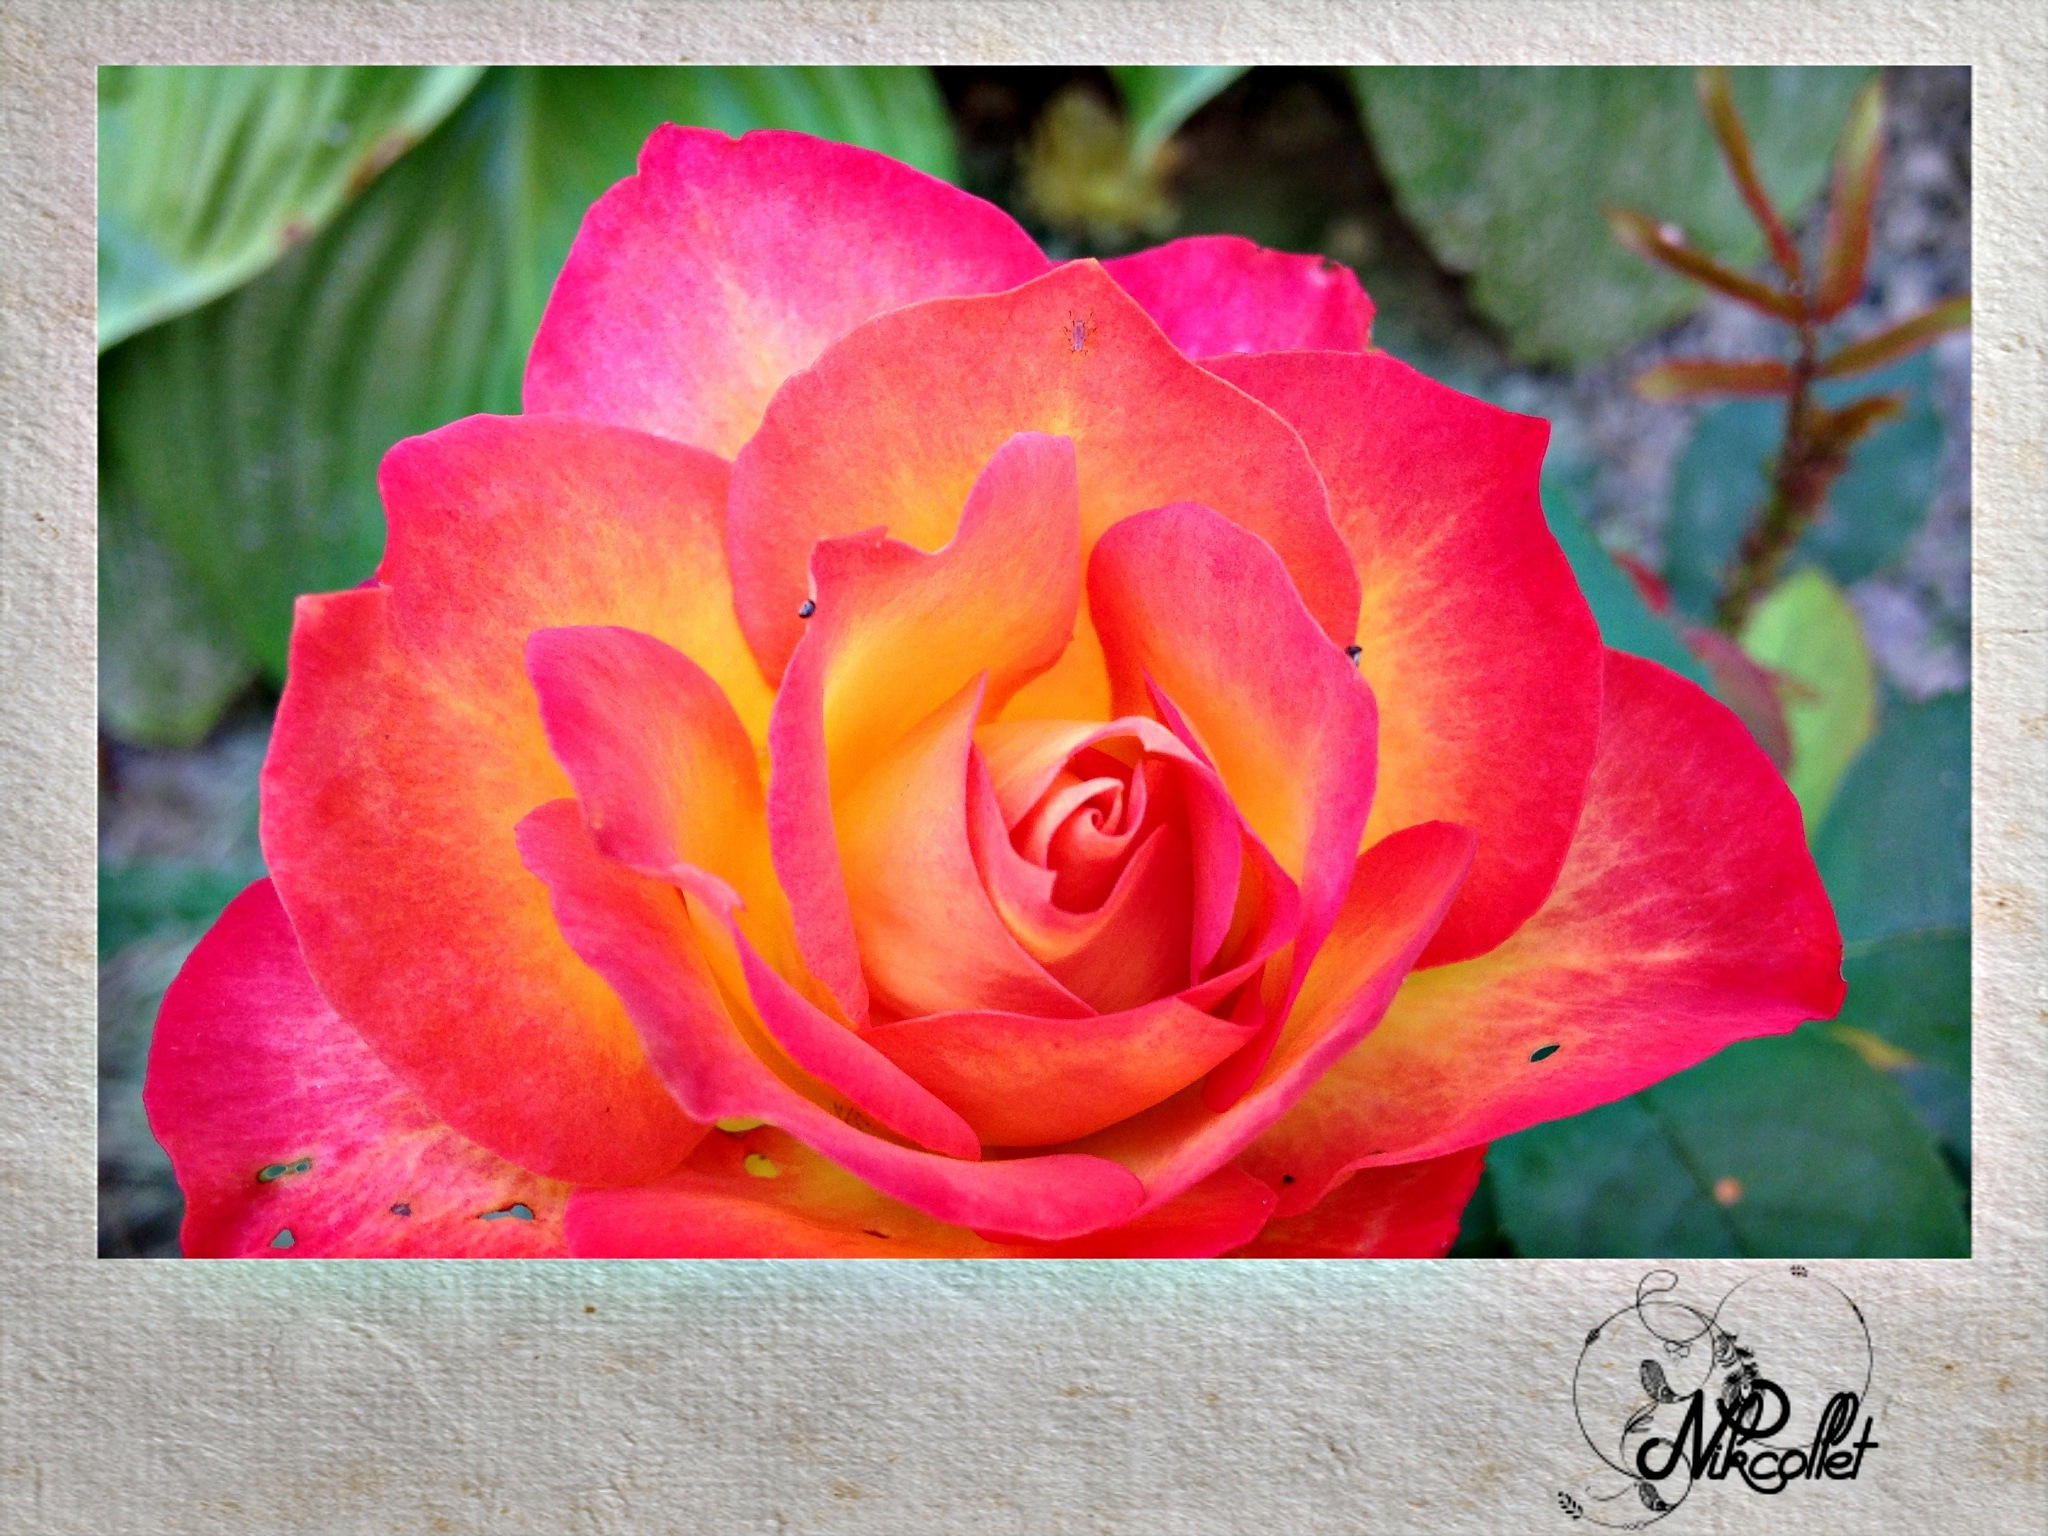 Beautiful Rose by Nikcollet C